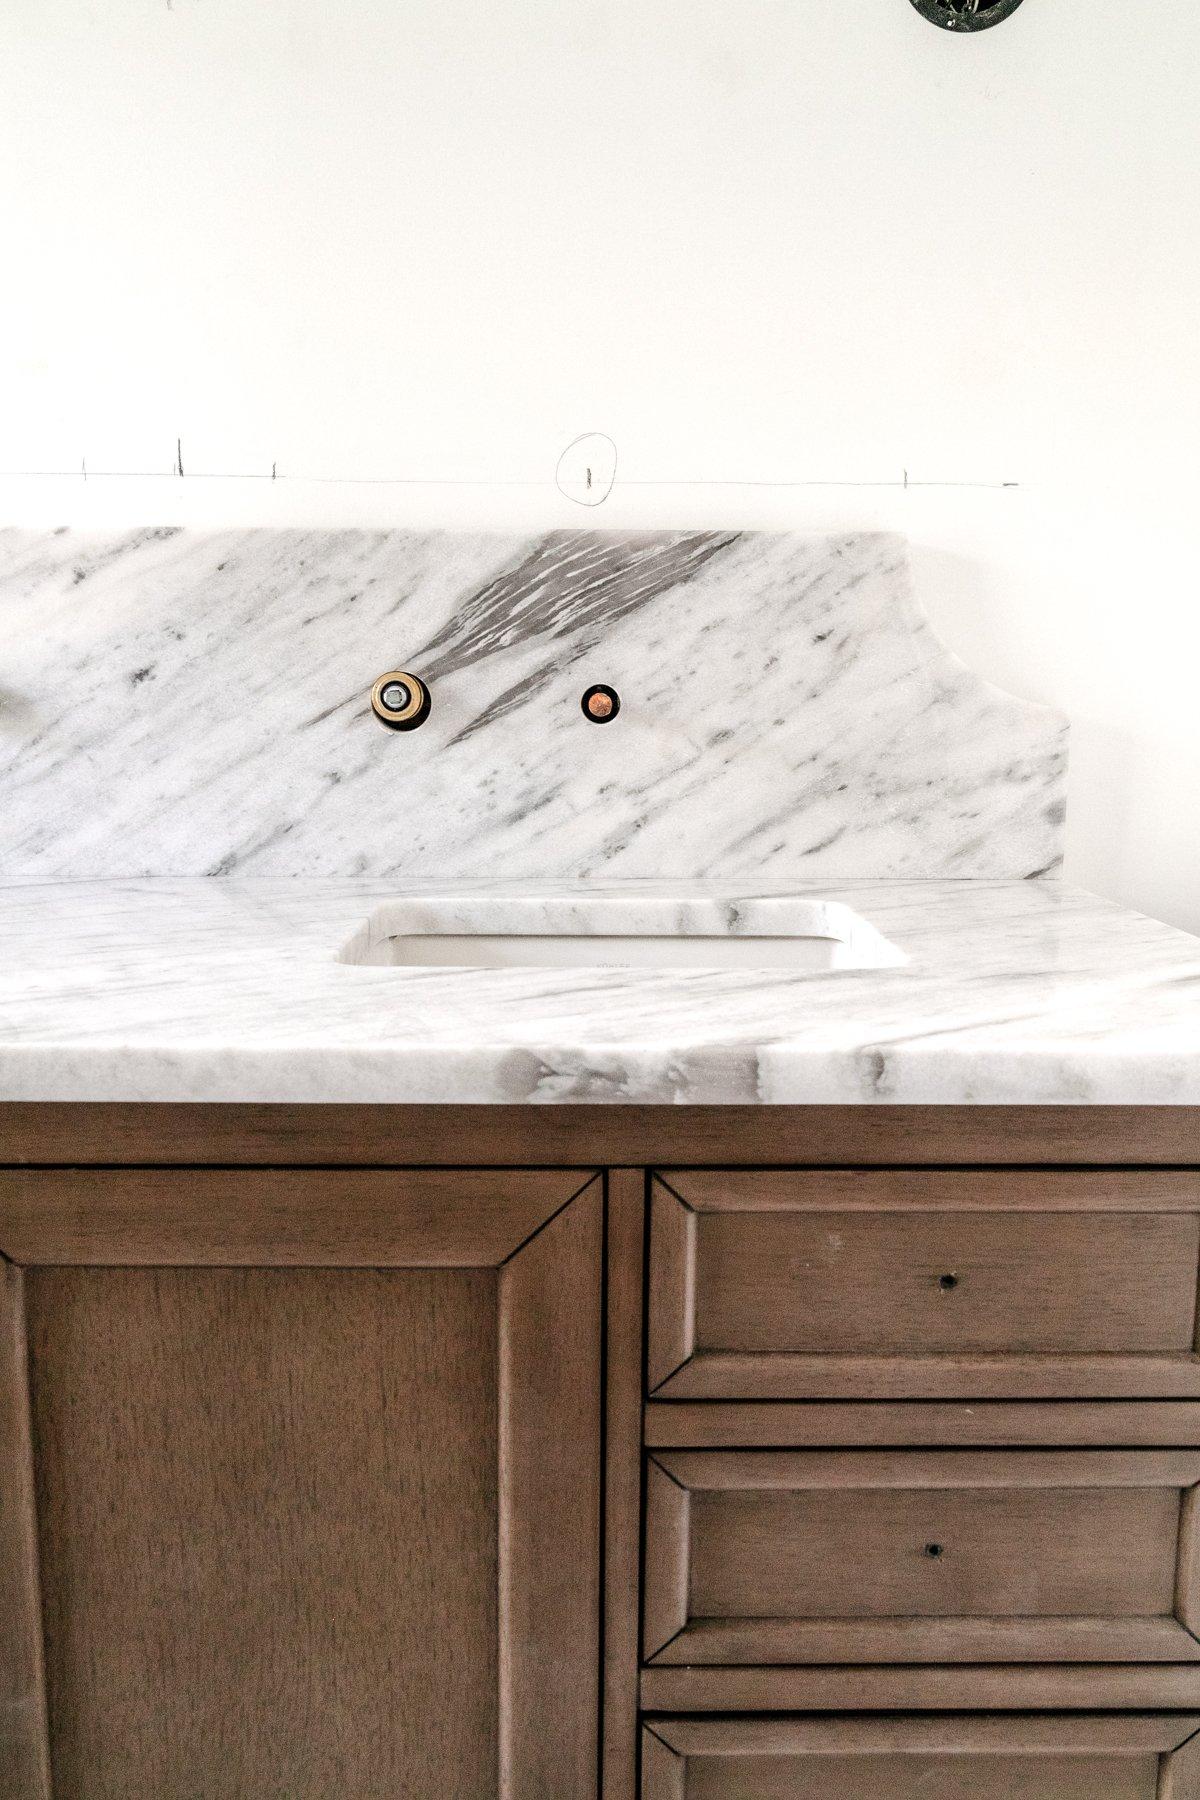 wood vanity with scalloped marble backsplash in a bathroom